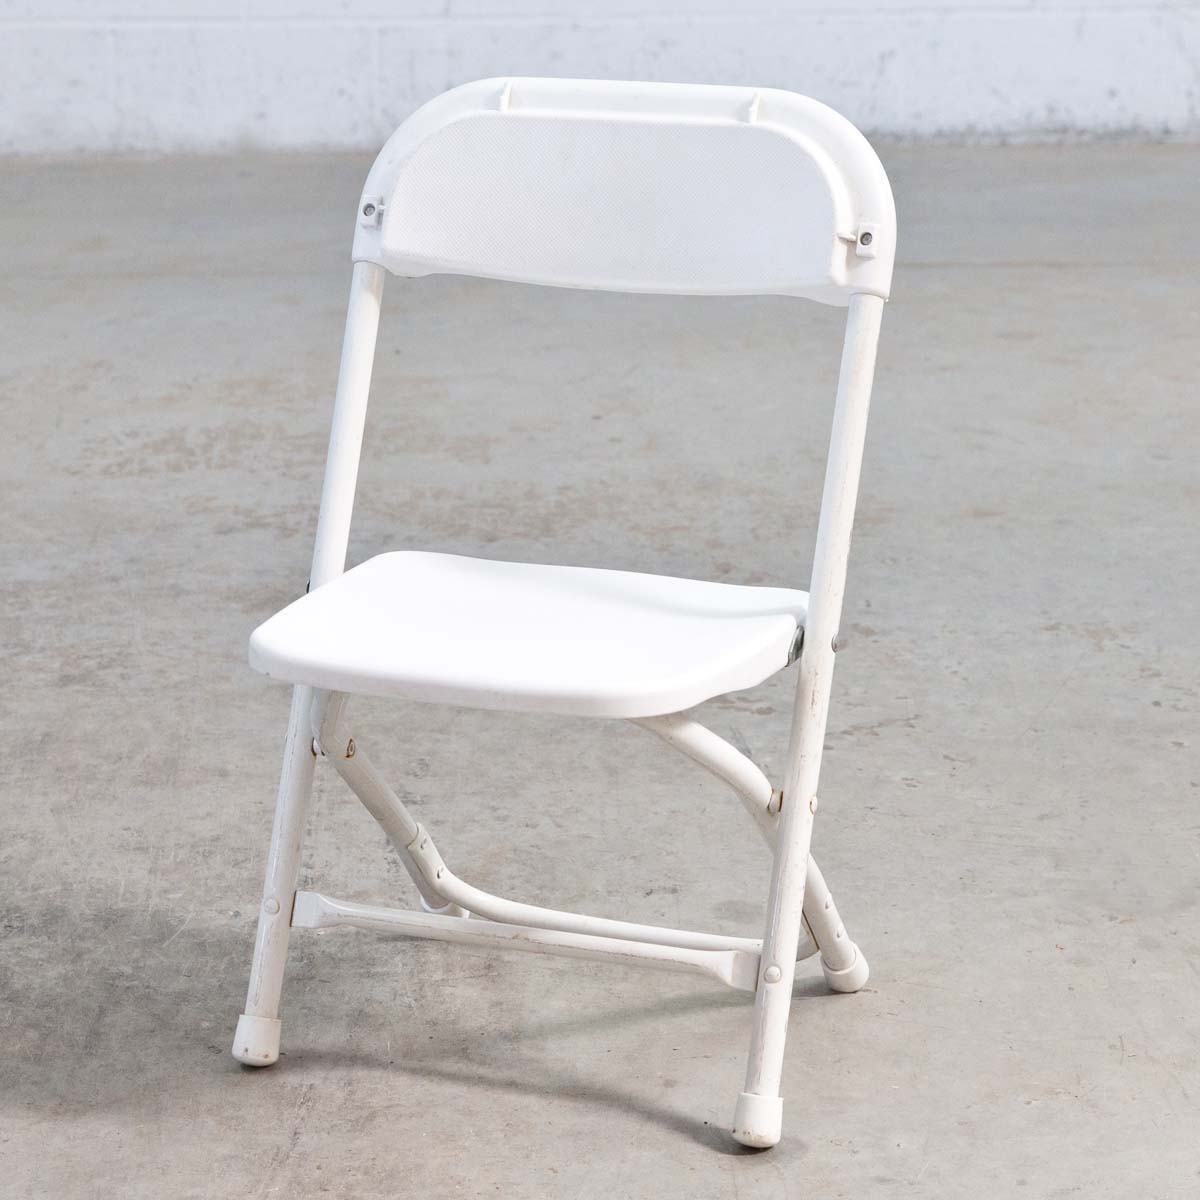 Chairs- Child's, folding